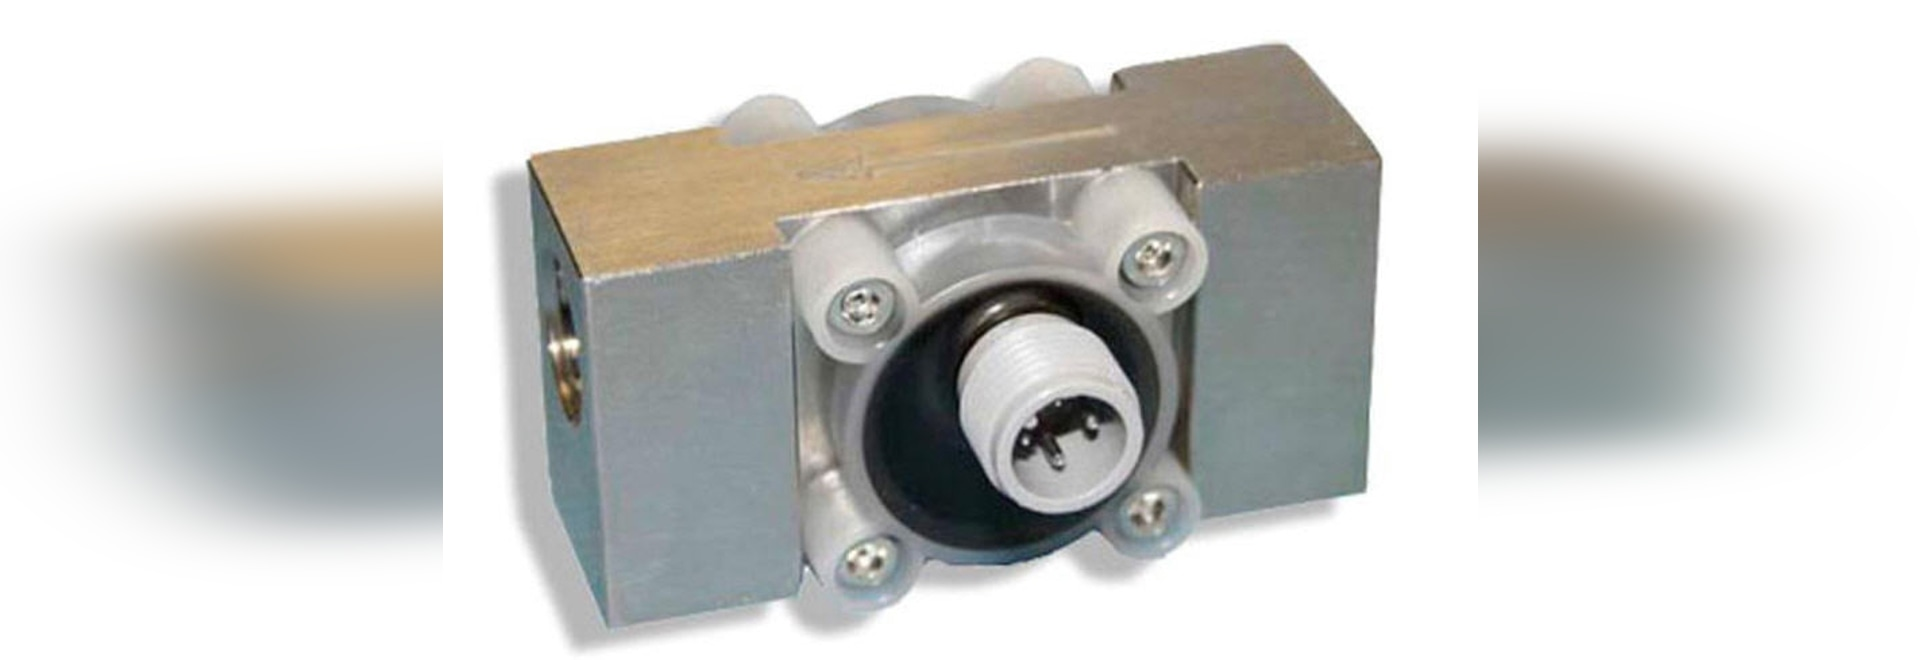 High-Pressure Flowmeter Measures Liquid Refrigerants